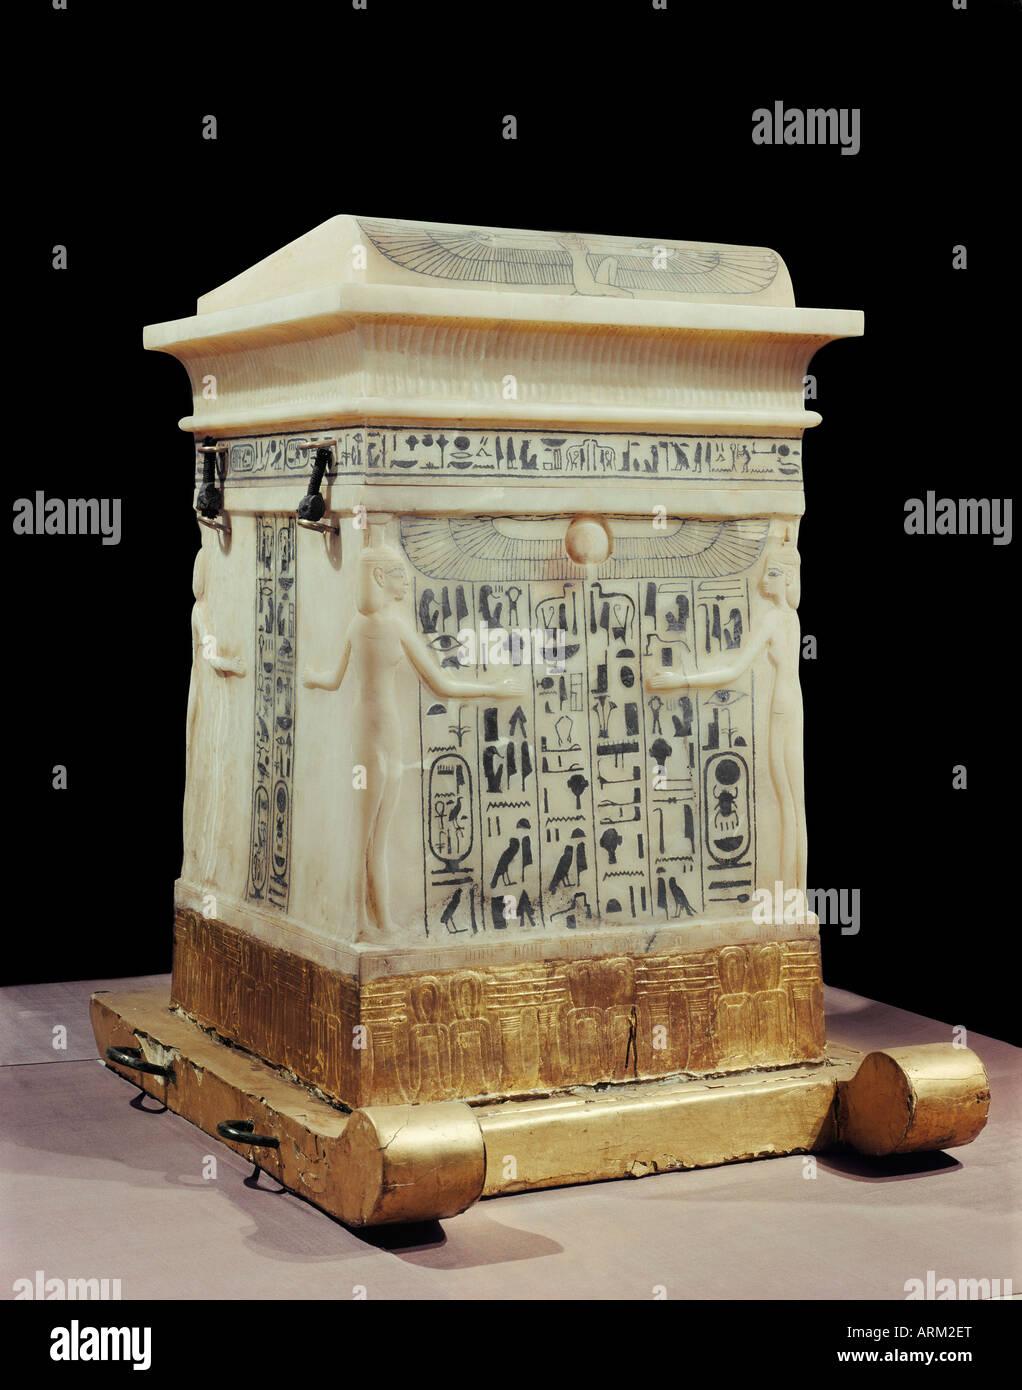 Alabaster canopic shrine, from the tomb of the pharaoh Tutankhamun - Stock Image